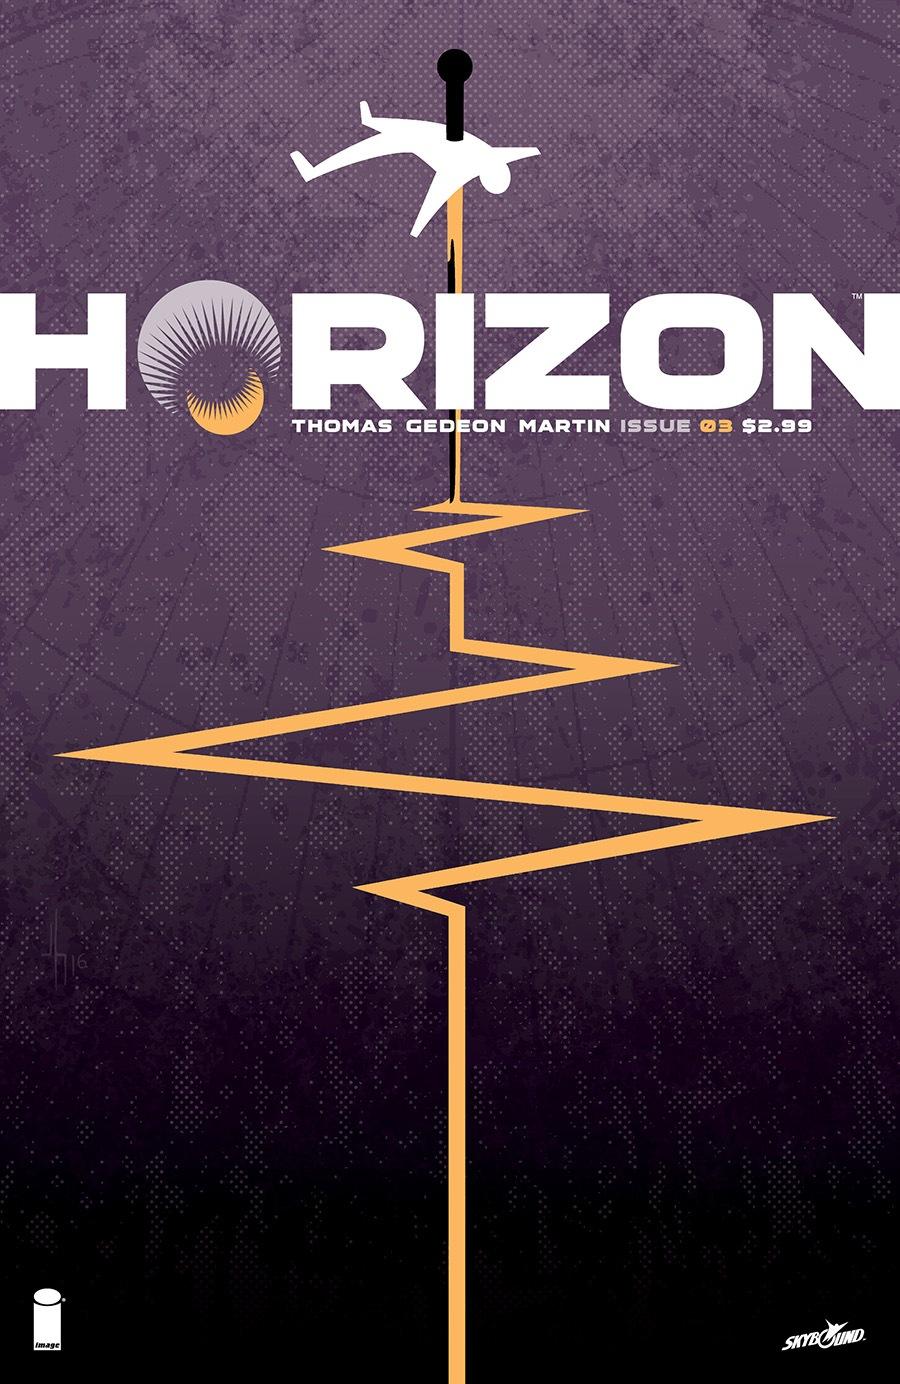 Horizon #3 Review